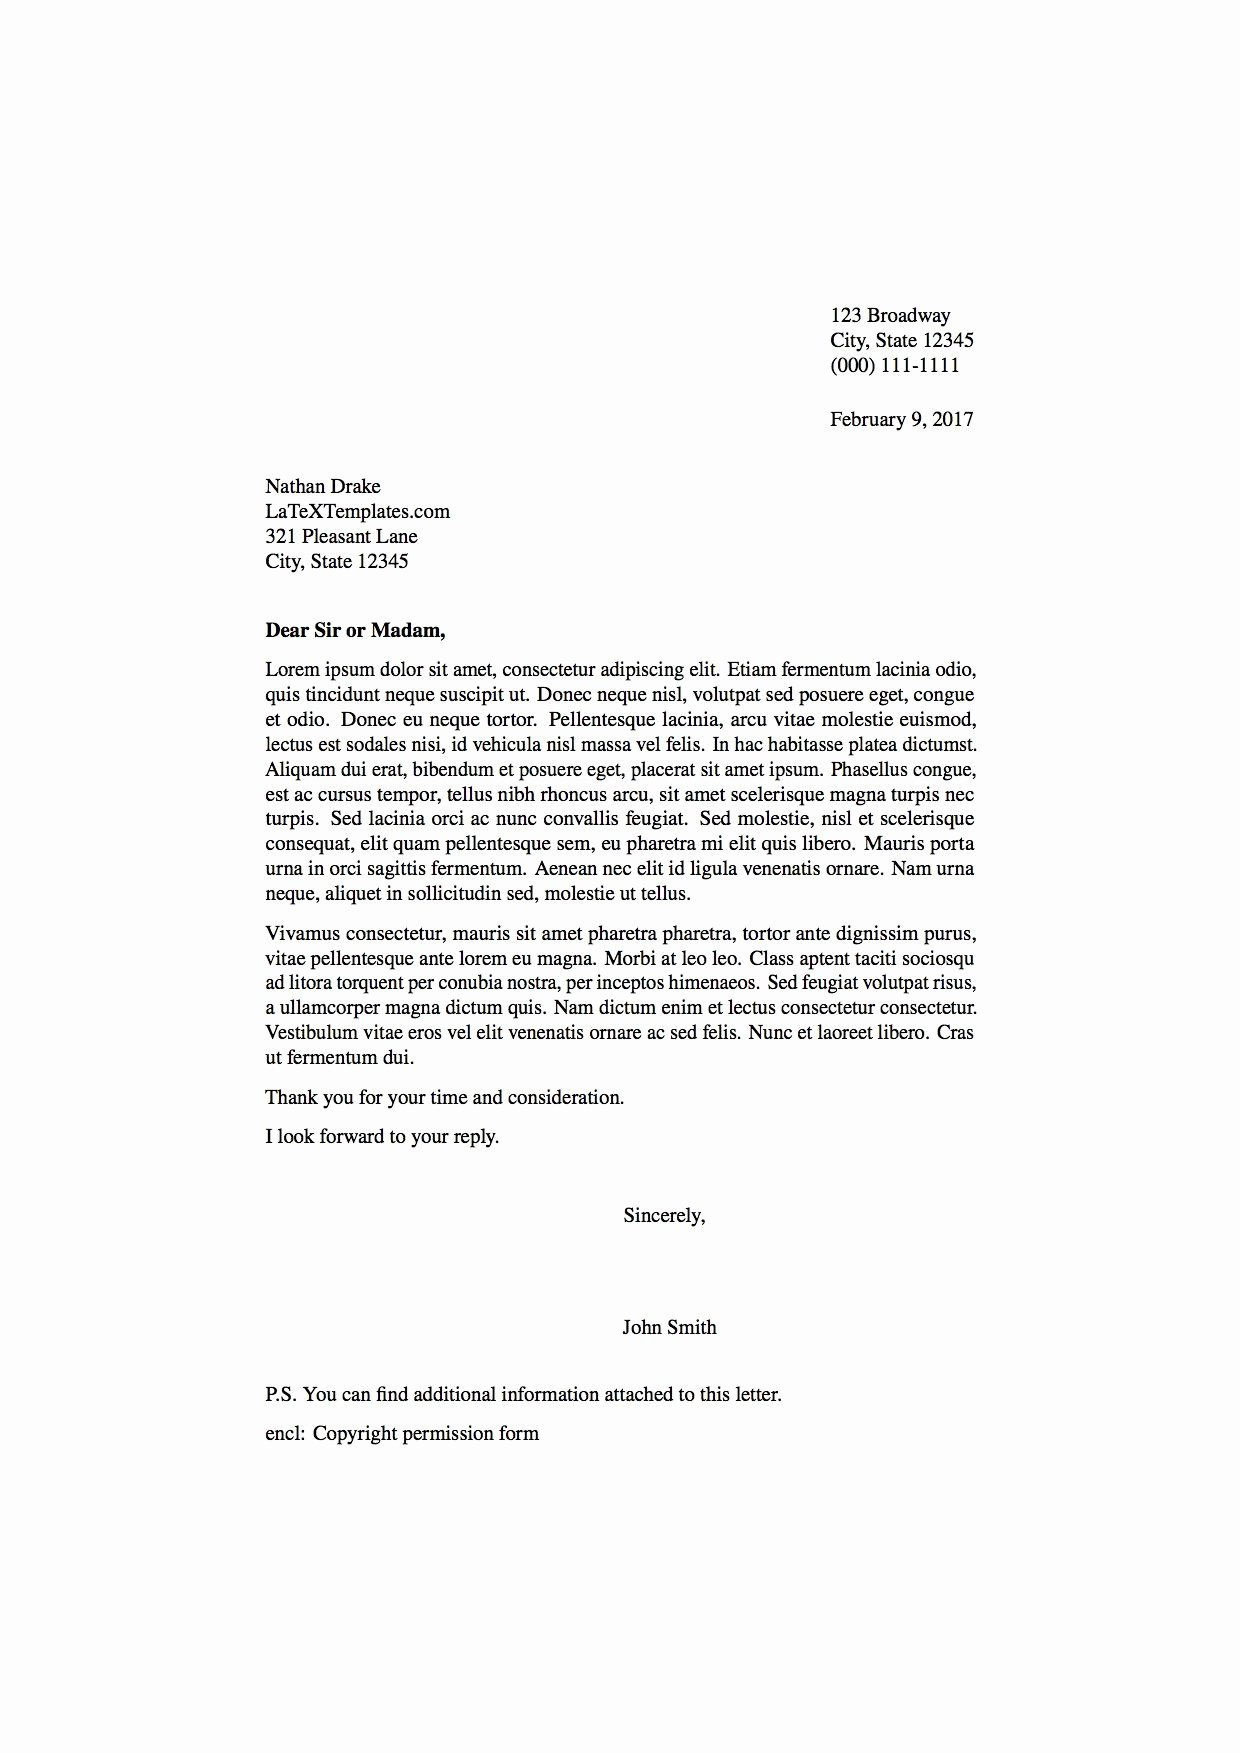 Letter to Congressman format Fresh formal Letter format to Congressman